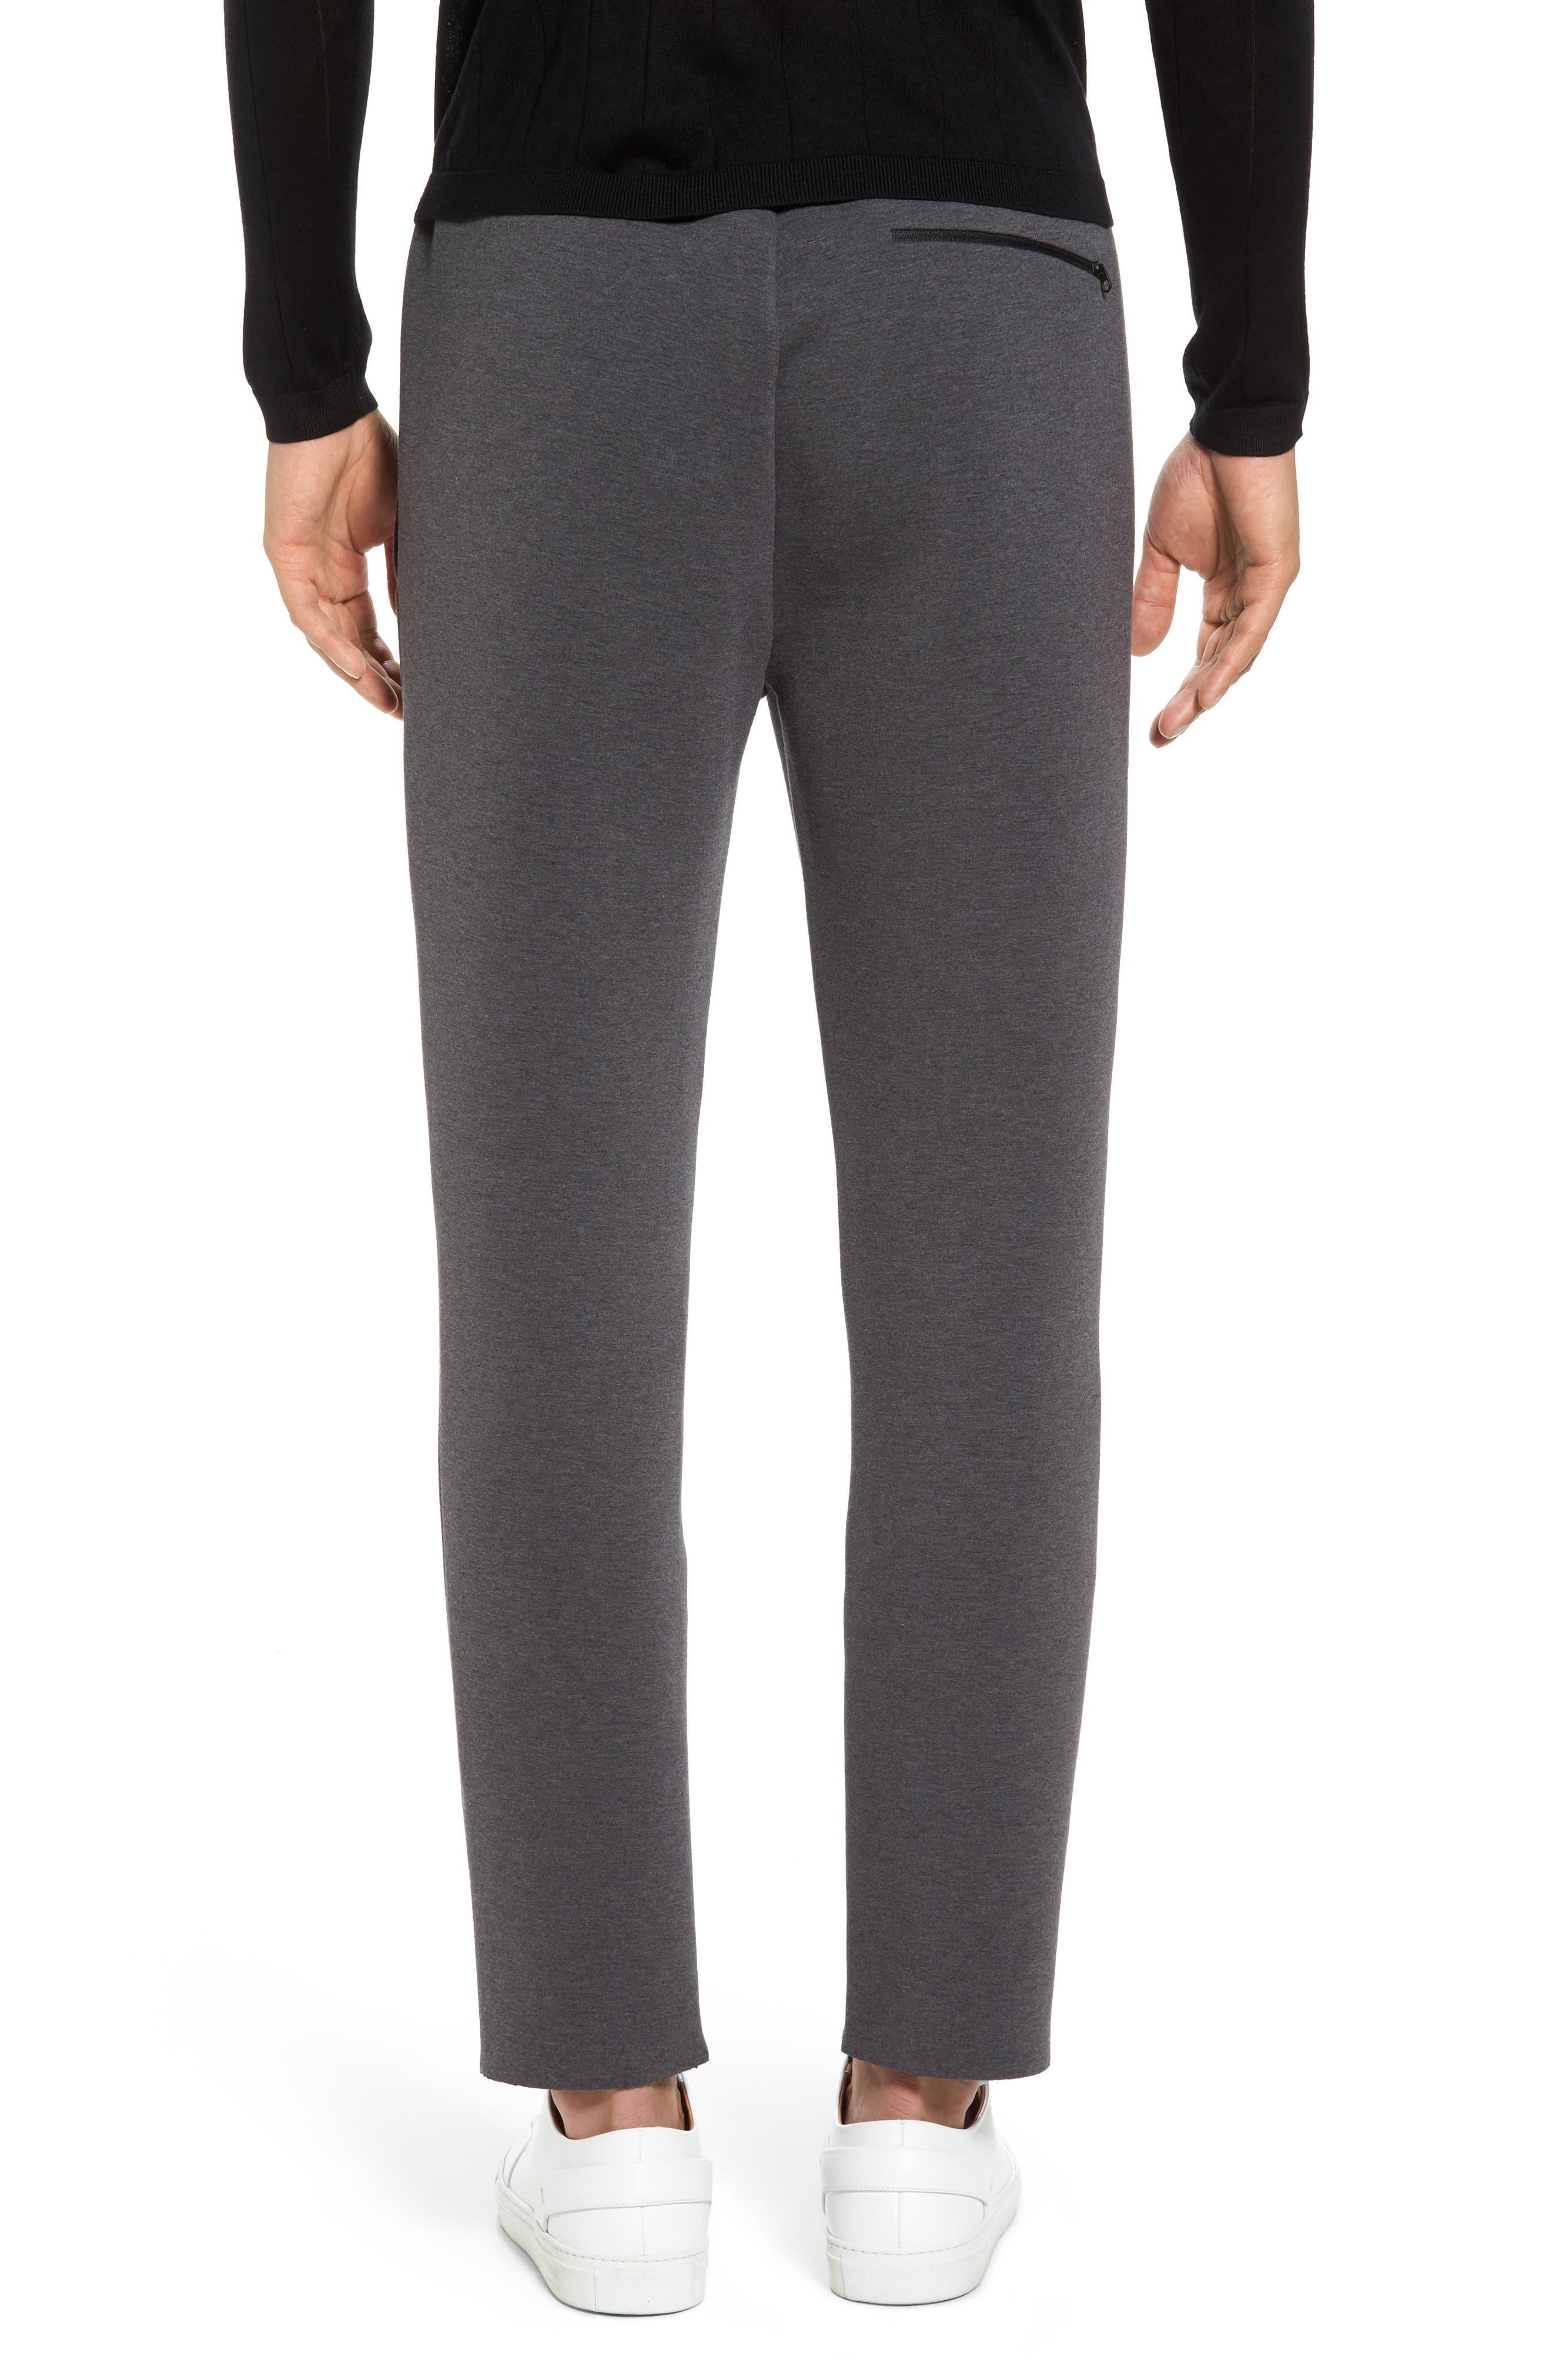 Knit Lounge Pants,                             Alternate thumbnail 2, color,                             Charcoal Heather